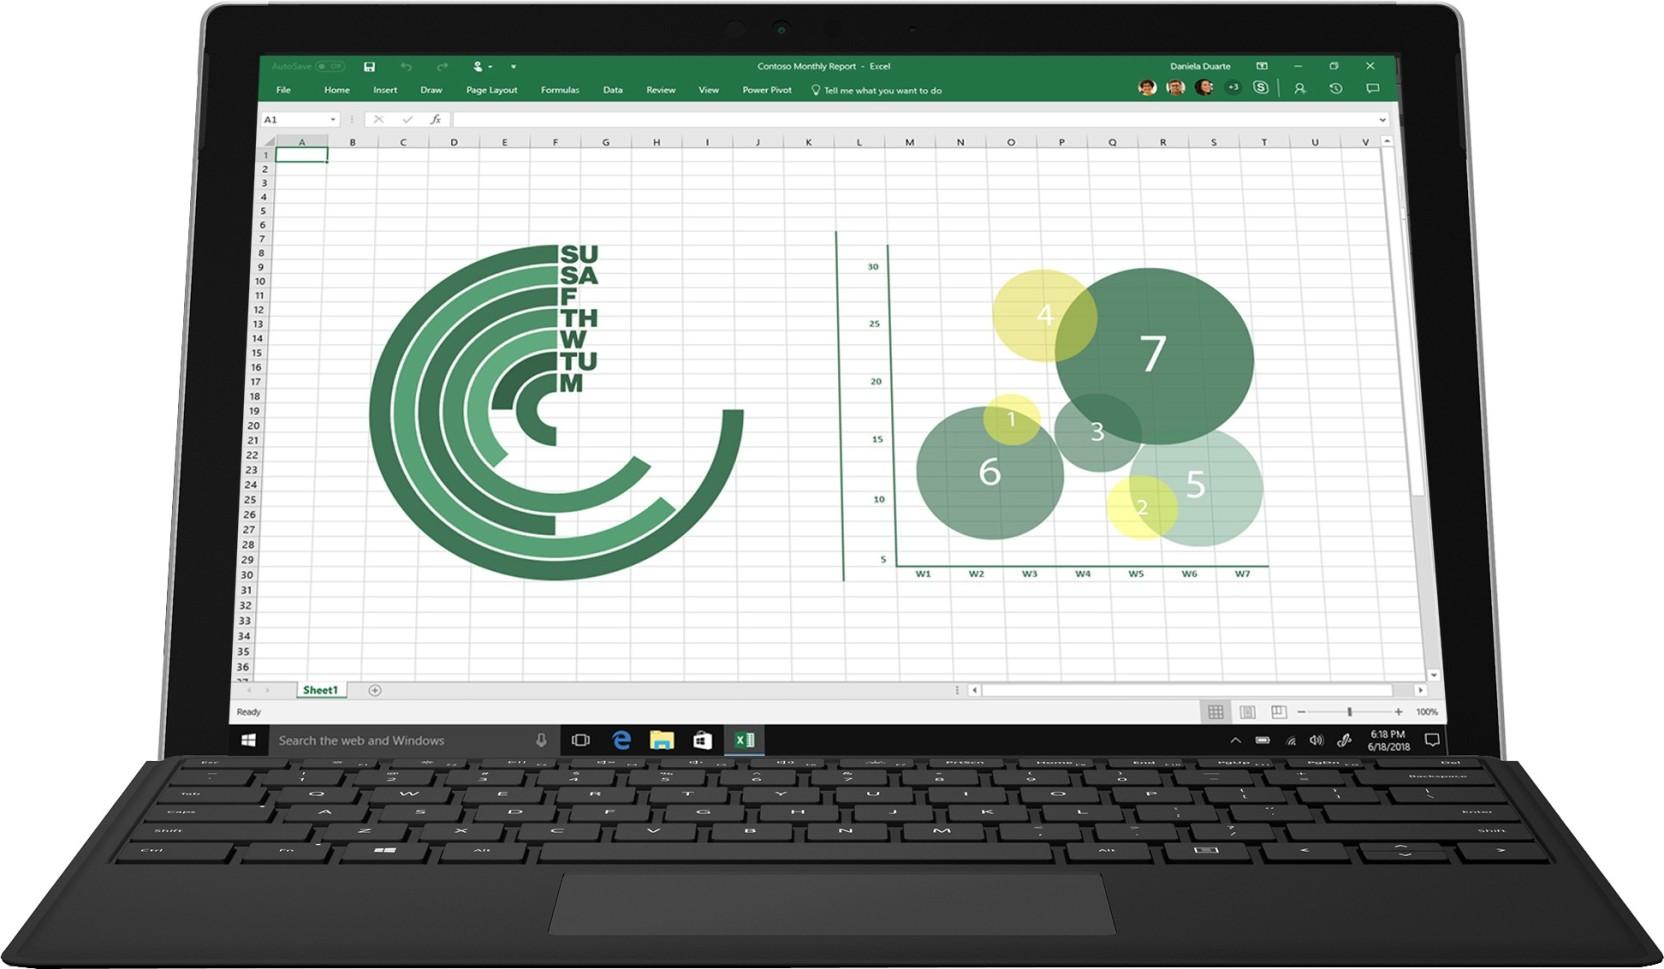 Microsoft Surface Pro Core i5 7th Gen - (8 GB/256 GB SSD